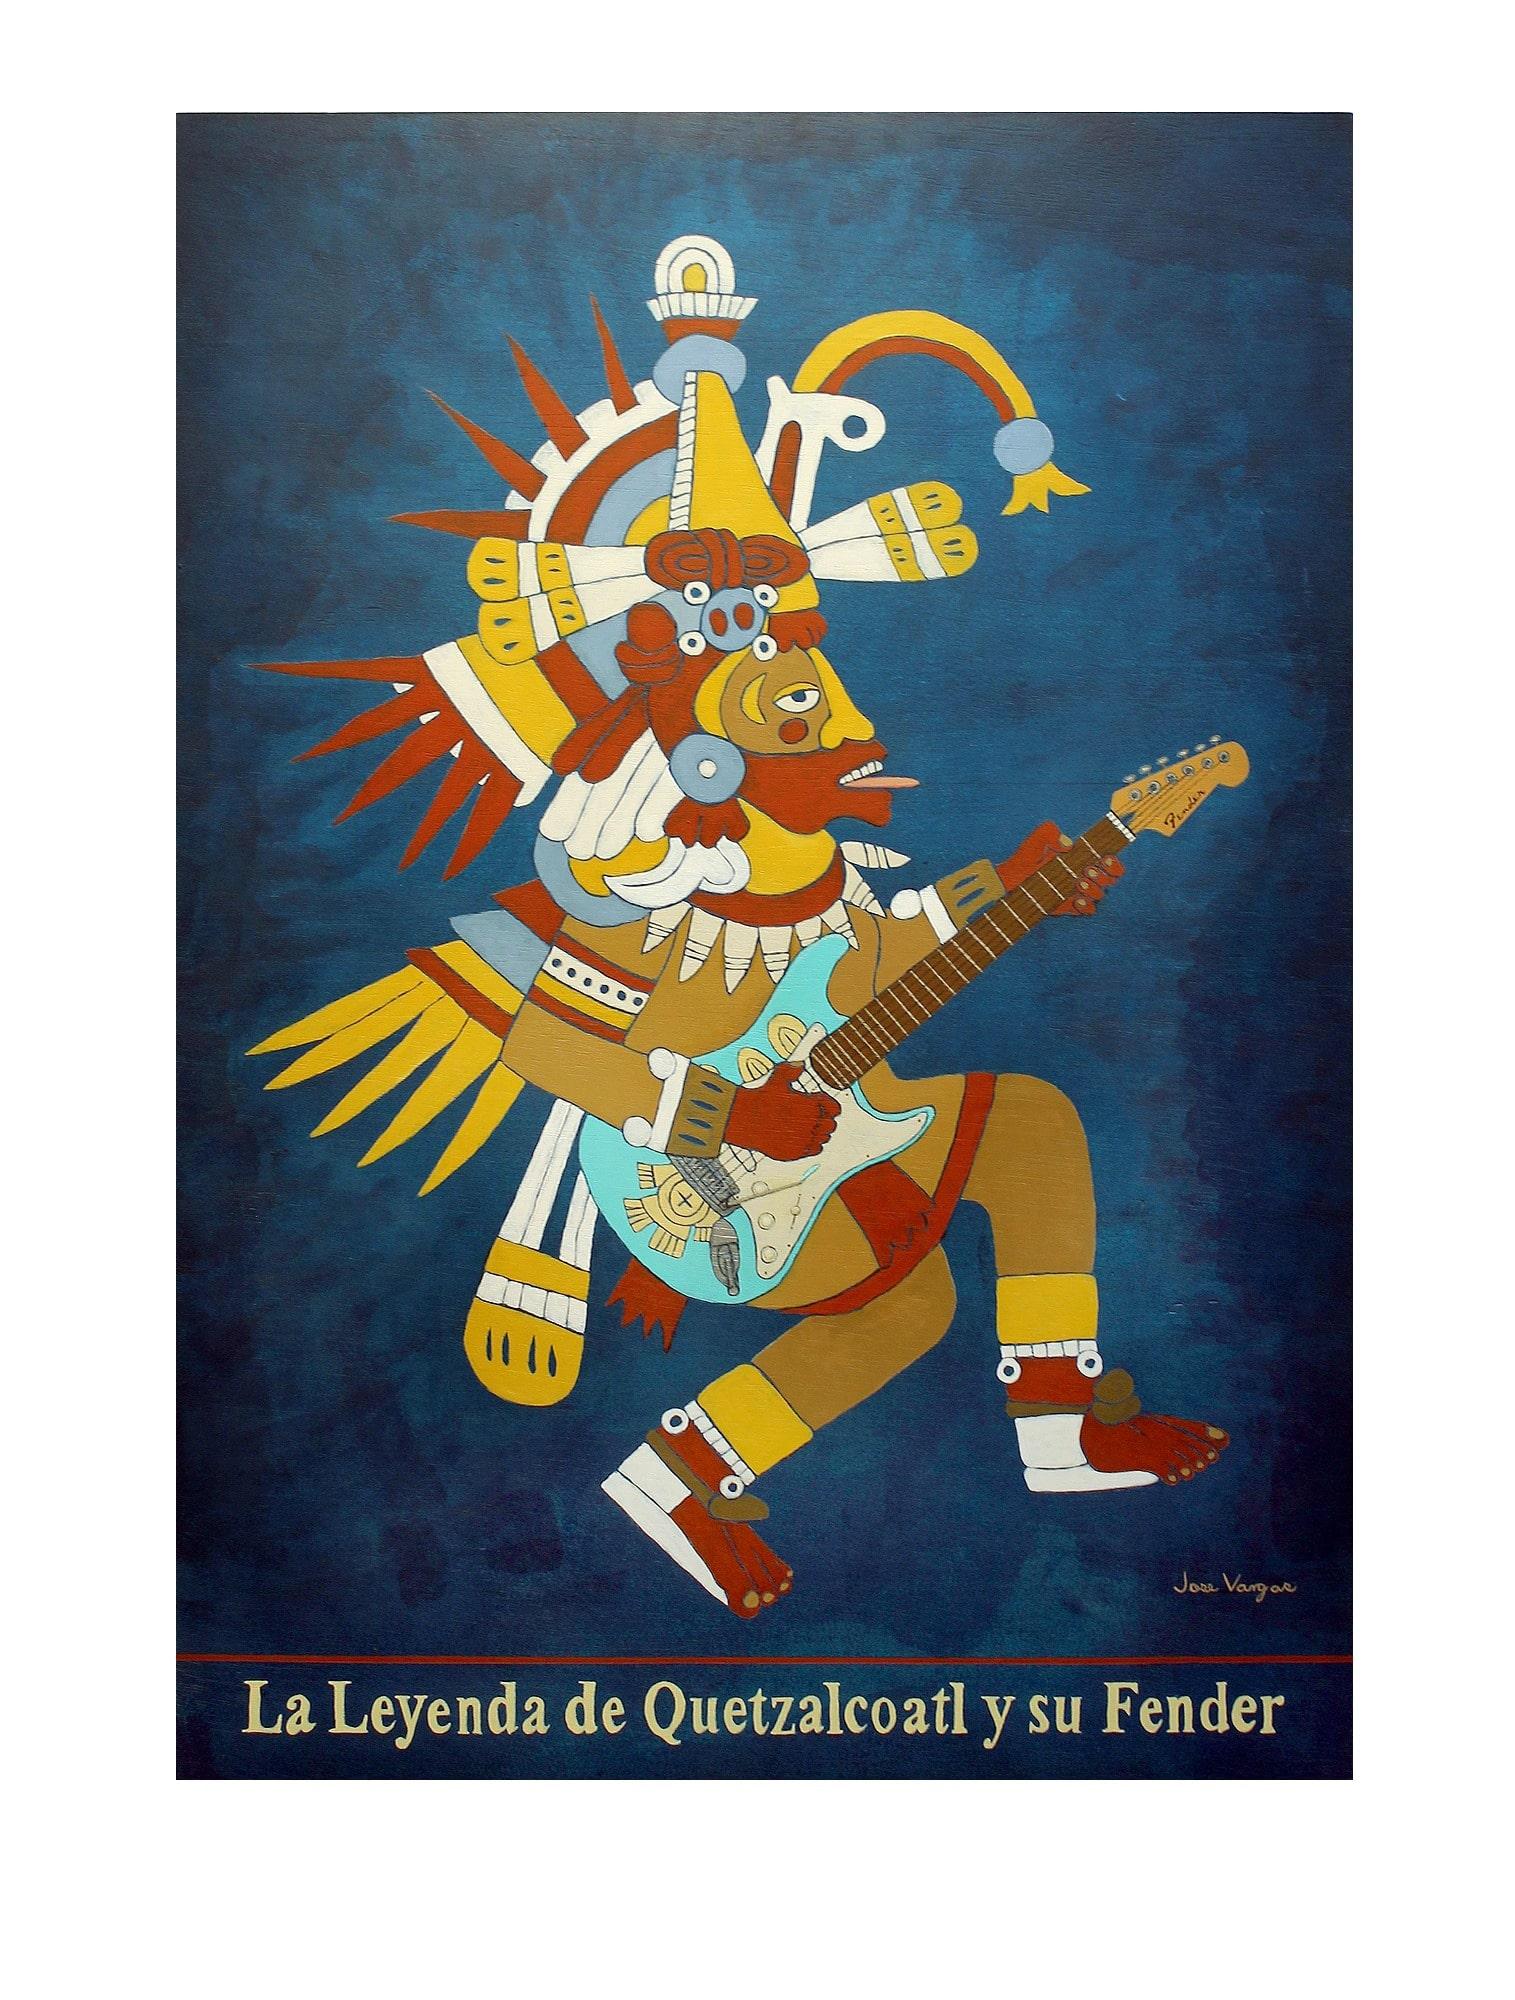 Latino Cultural Center art exhibit, Quetzal Quatro: Genaro Hernandez, Juan J. Hernandez, Samuel Torres and Jose Vargas